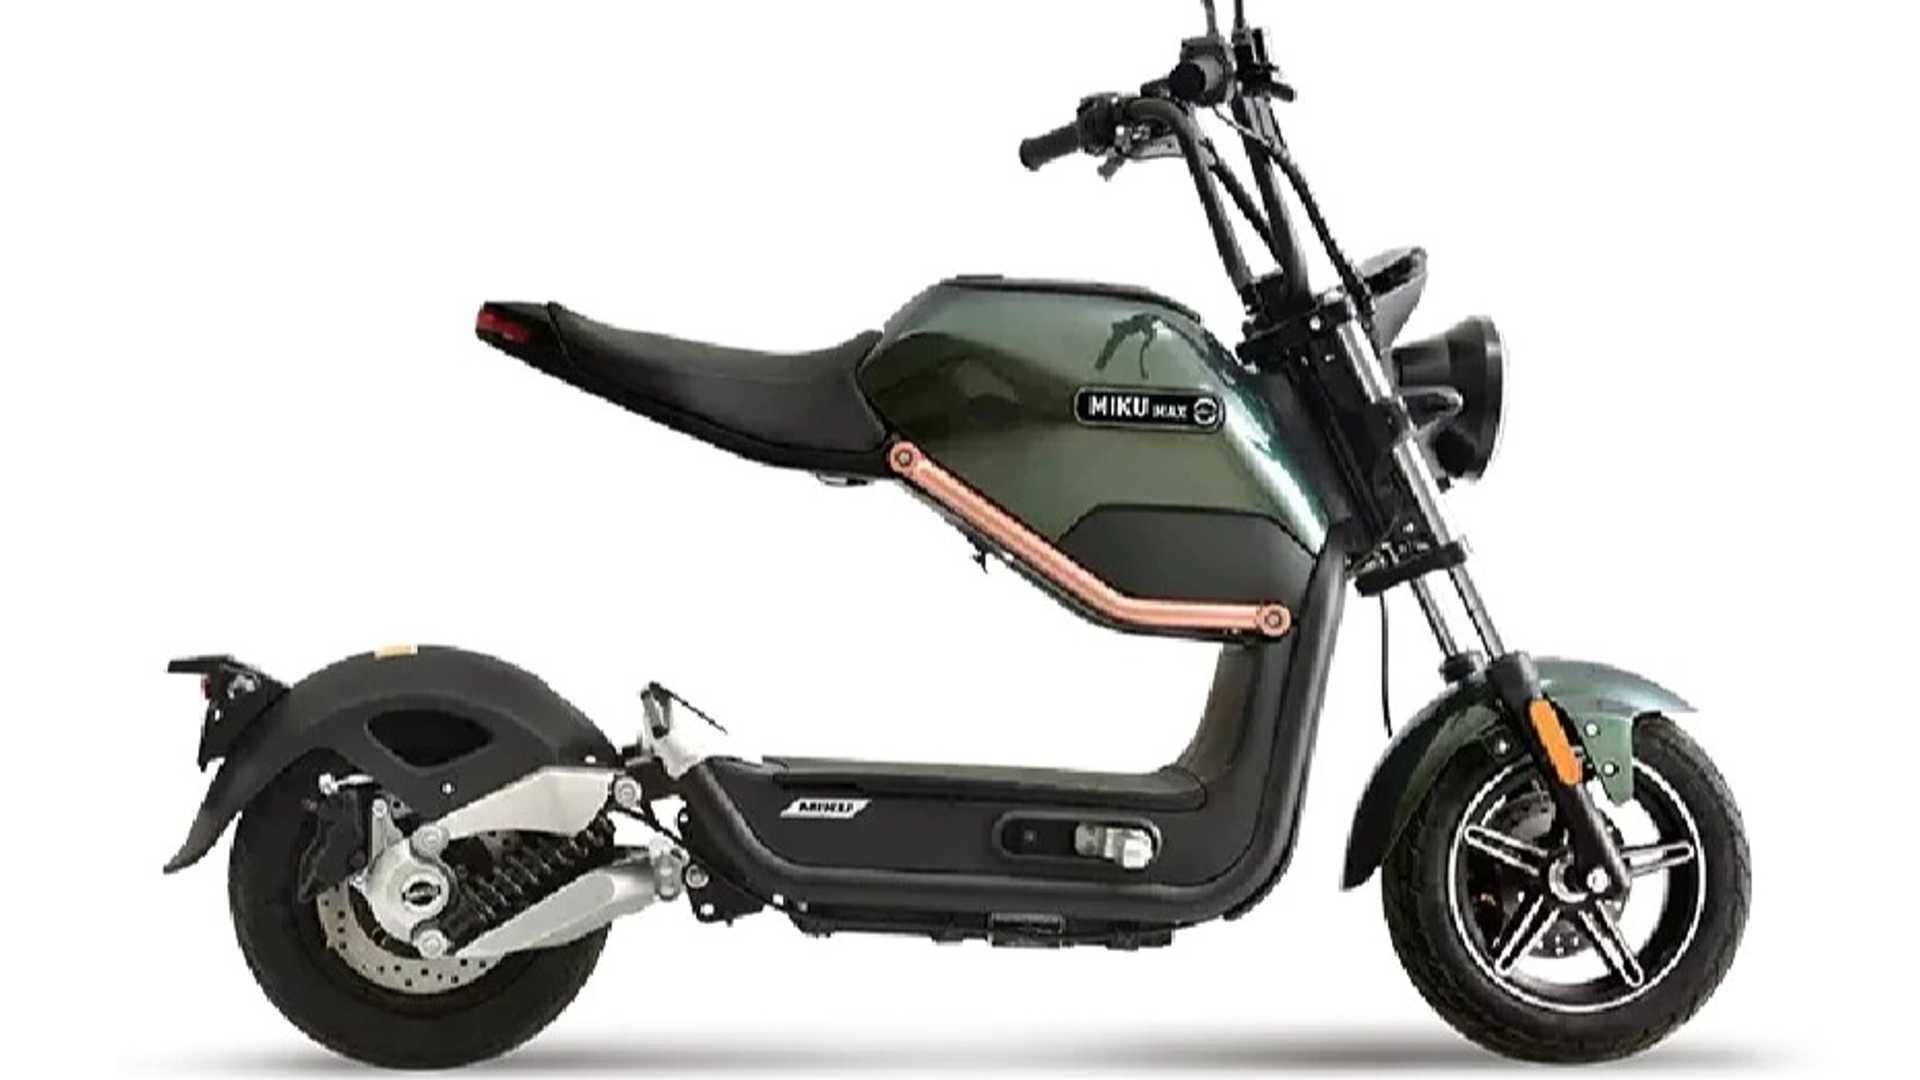 Sunra Miku Max E-Scooter,Sunra Miku Max E-Scooter,sunra miku max electric scooter,sunra miku max elektrikli scooter,sunra miku max elektrikli scooter mavi,sunra miku max elektrikli scooter turuncu,scooter sunra miku max,scooter eléctrico sunra miku max,scooter électrique sunra miku max,scooter eléctrico sunra miku max verde